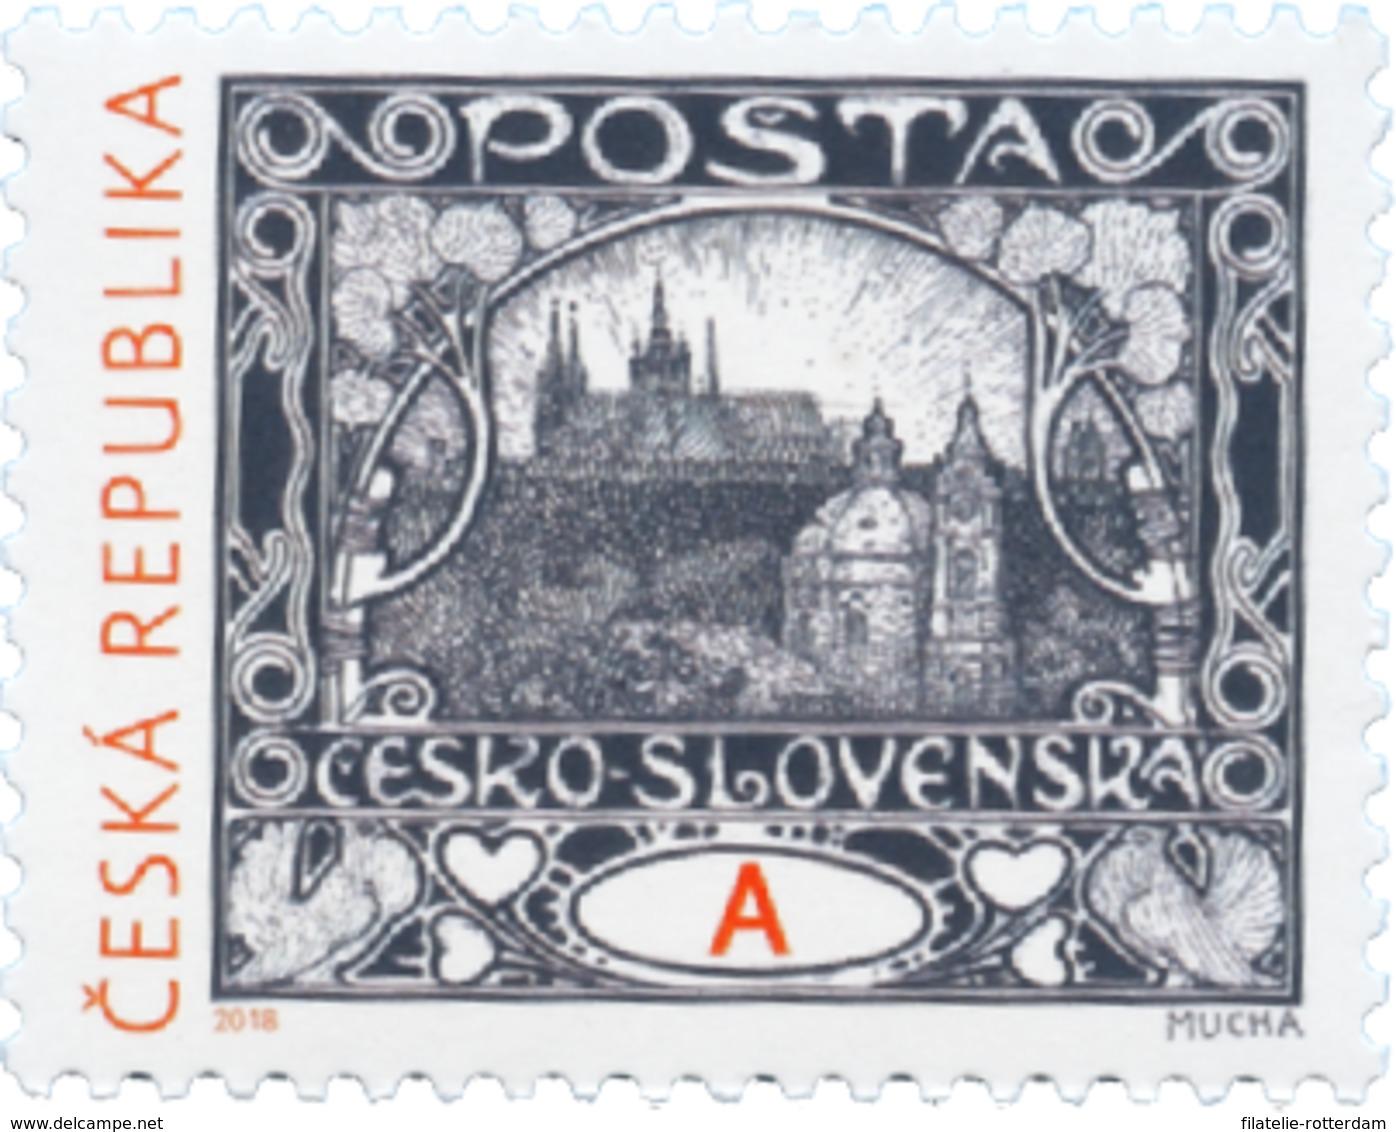 Tsjechië / Czech Republic - Postfris/MNH - Kasteel Van Praag 2018 - Tsjechië